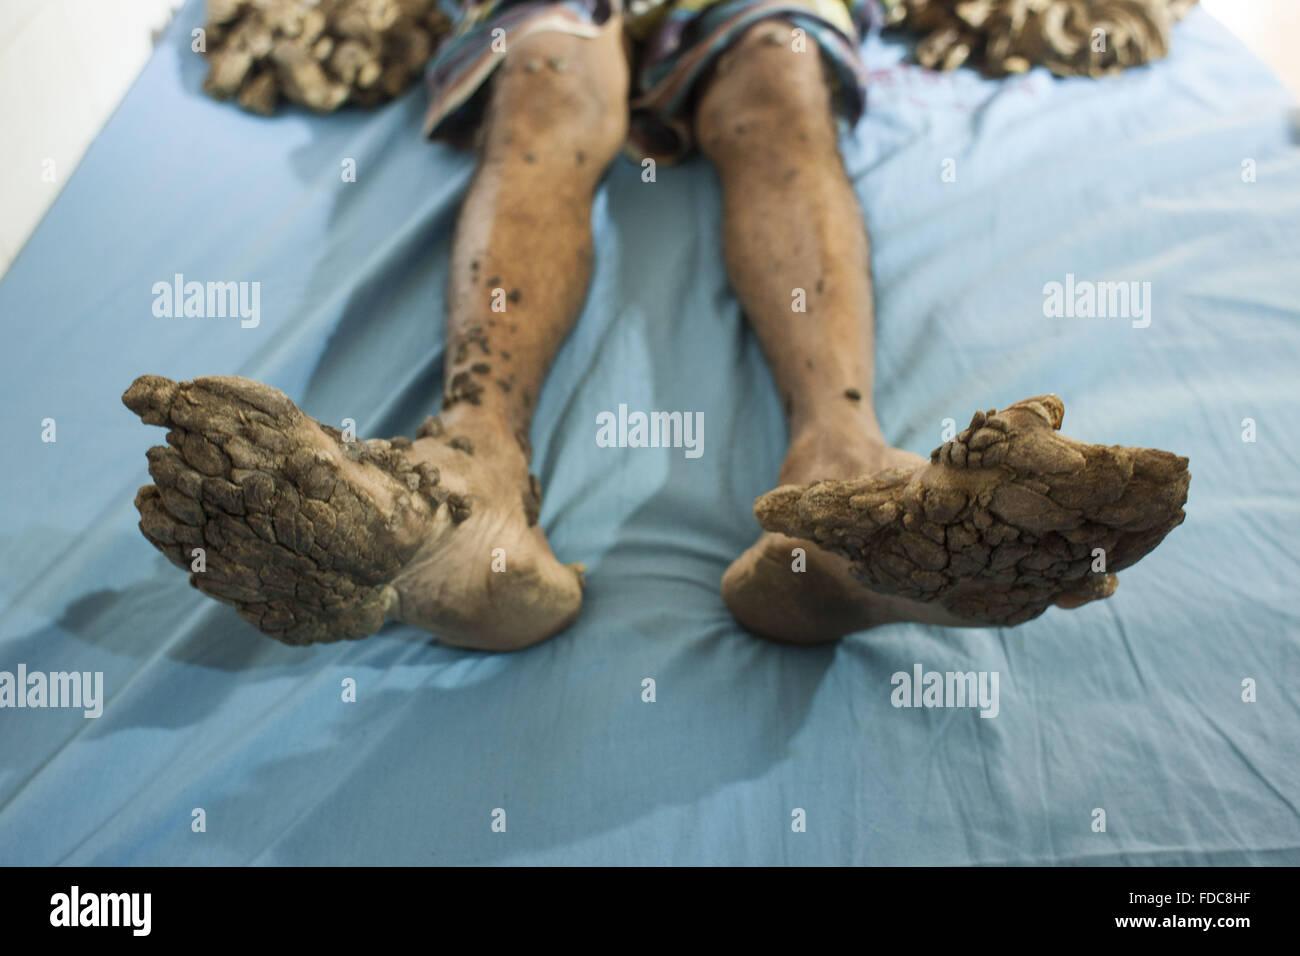 Dhaka bangladesh 30th jan 2016 bangladeshi man abul bazadar 25 bangladeshi man abul bazadar 25 has been suffering from a rare skin disease called human pappiloma virus since 10 years his skin appears to have tree publicscrutiny Choice Image